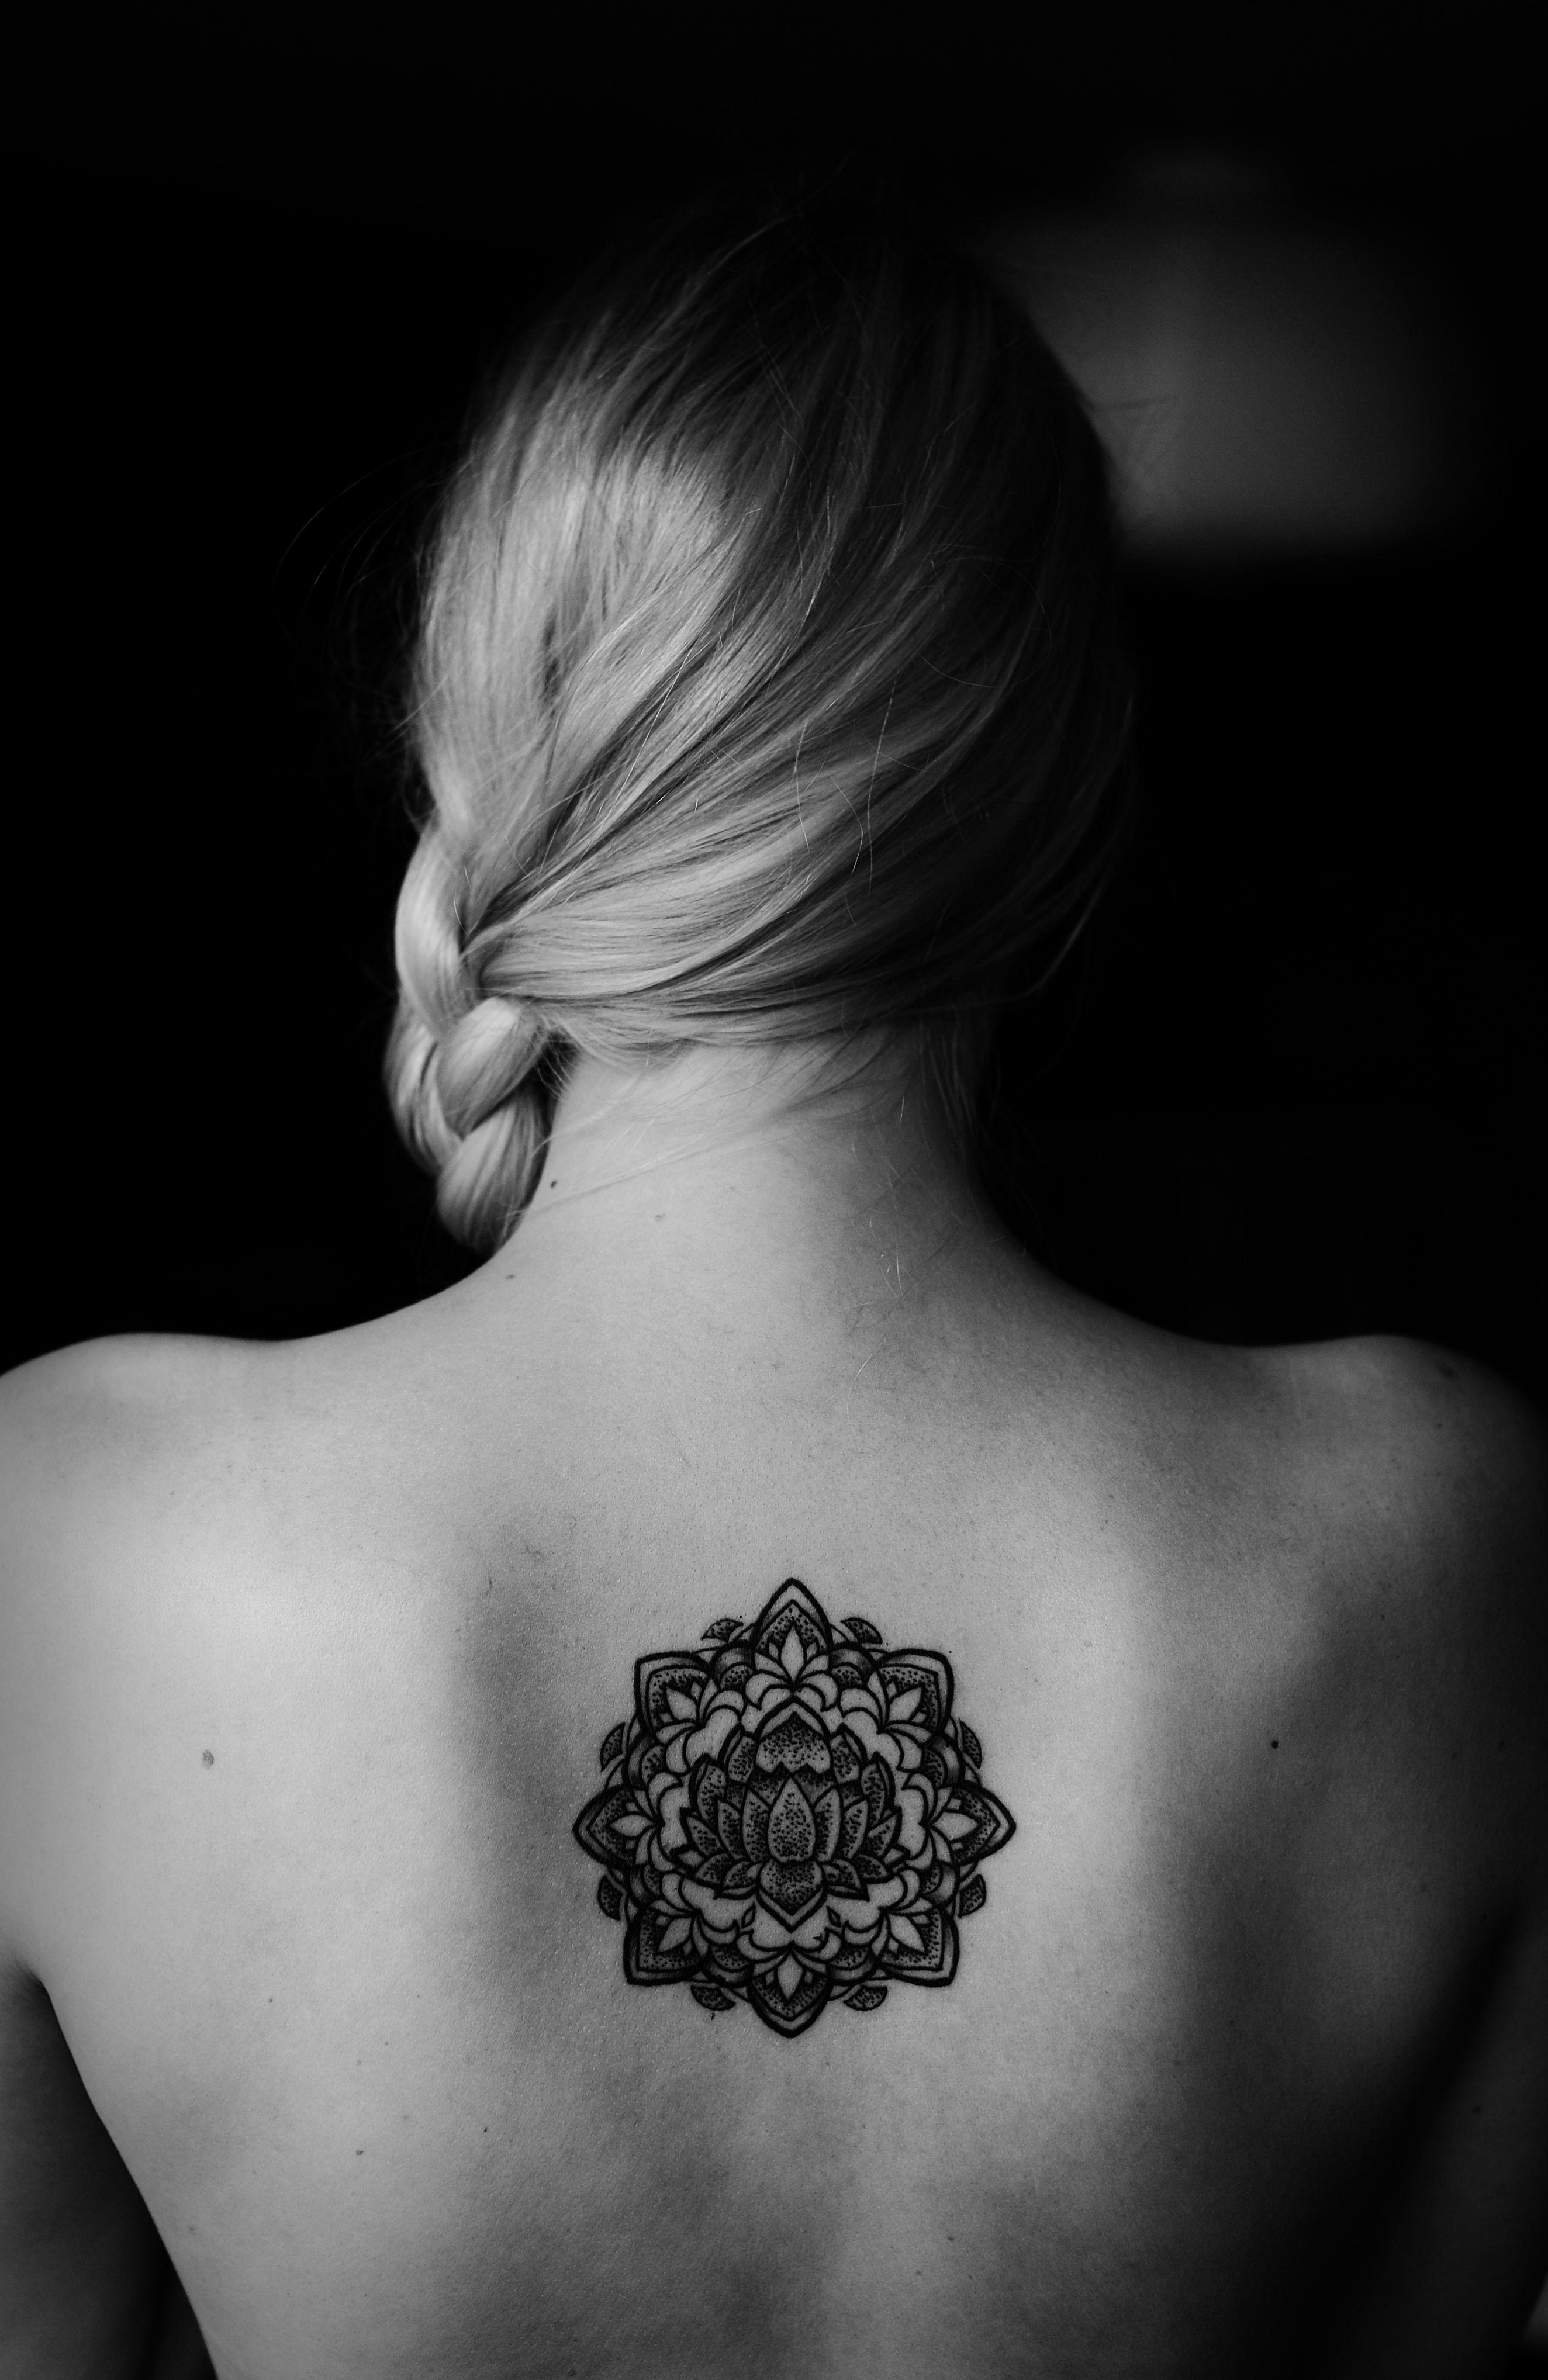 My lotus flower tattoo tatz pinterest flower tattoos lotus my lotus flower tattoo izmirmasajfo